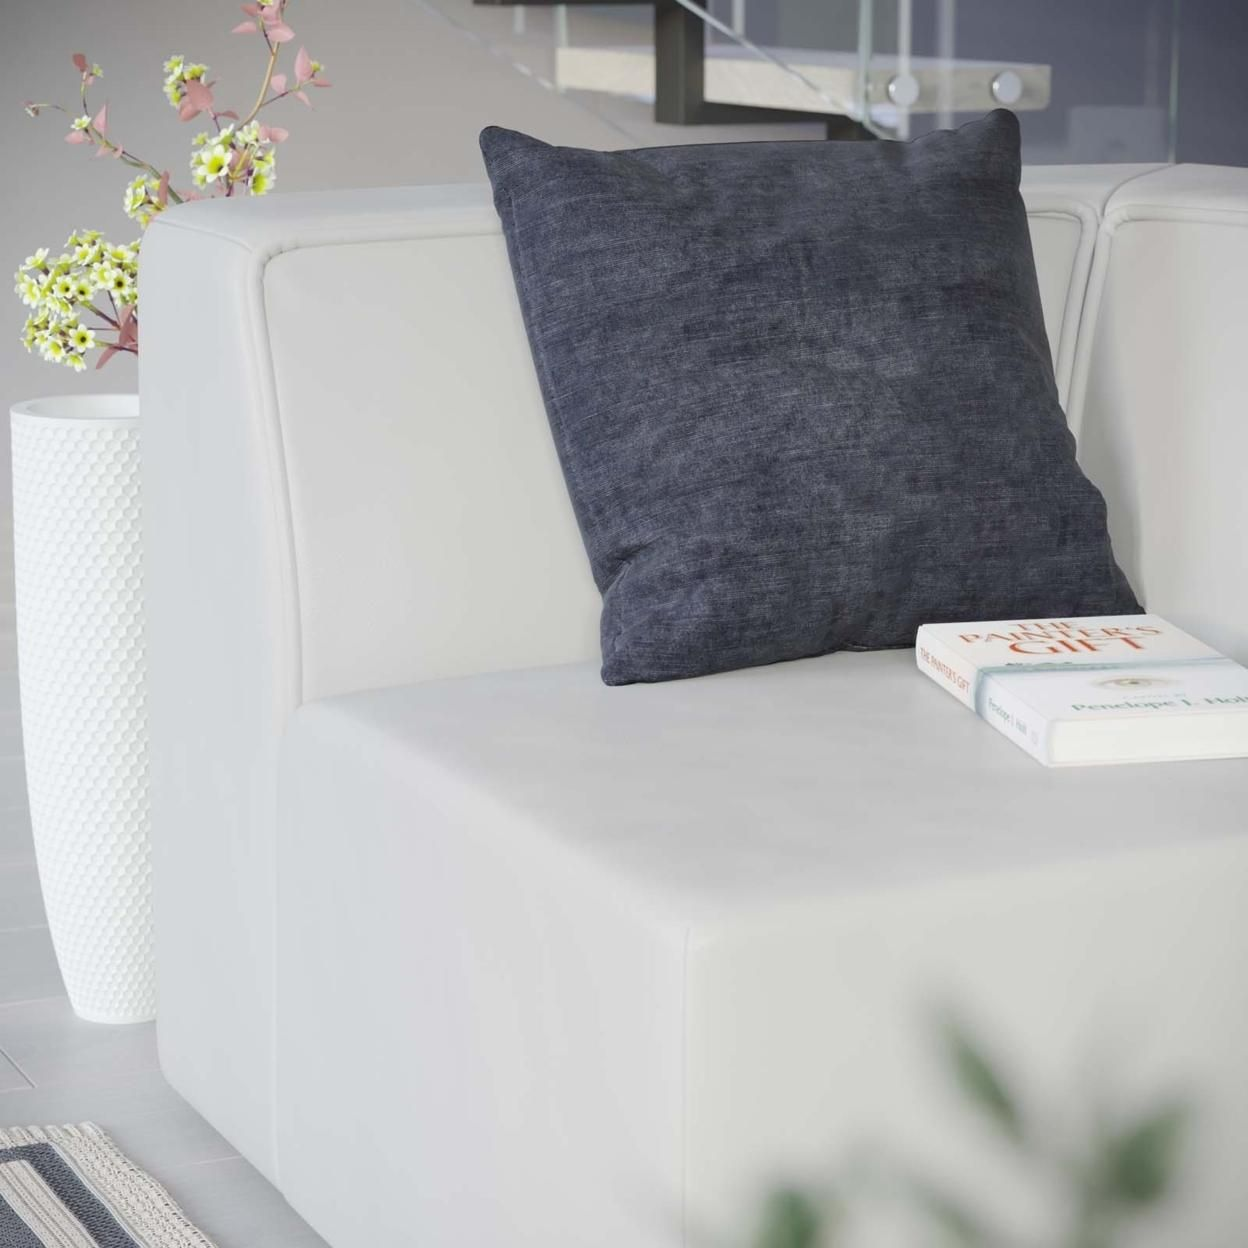 Mingle Vegan Leather Corner Chair, White